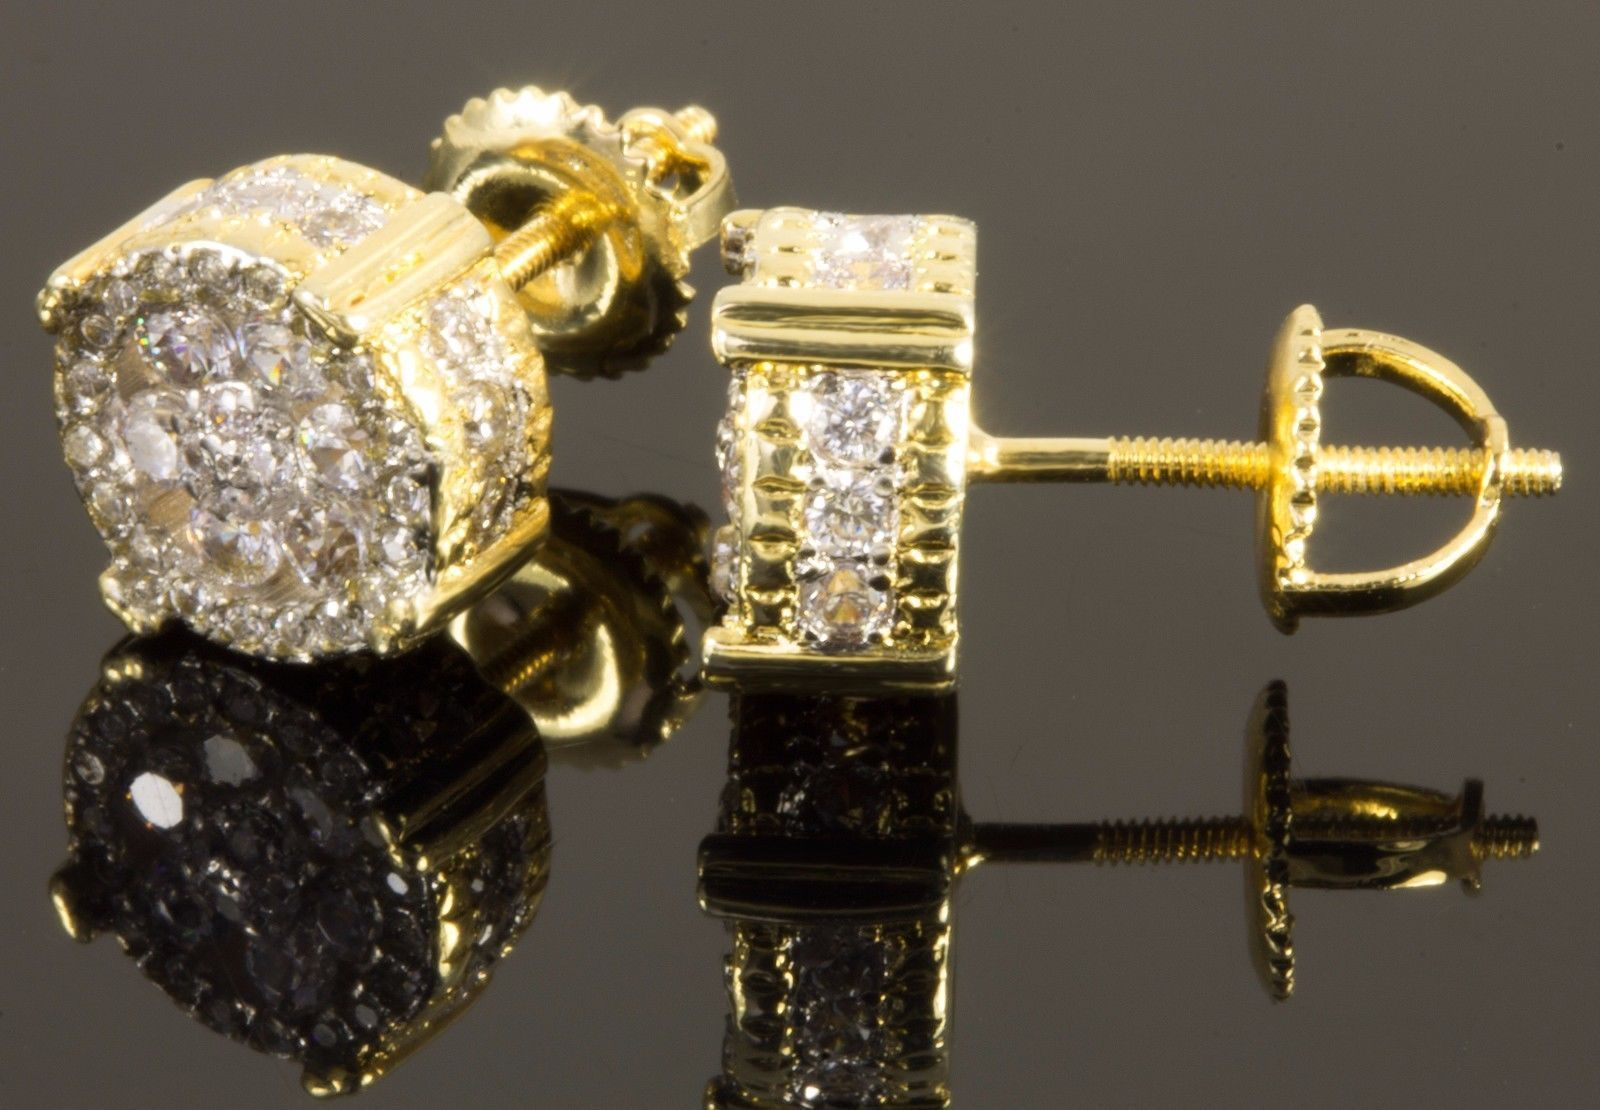 1Carat Sim Diamond 14K Yellow Gold Plated Hip-Hop Stud Earrings Screw-Back